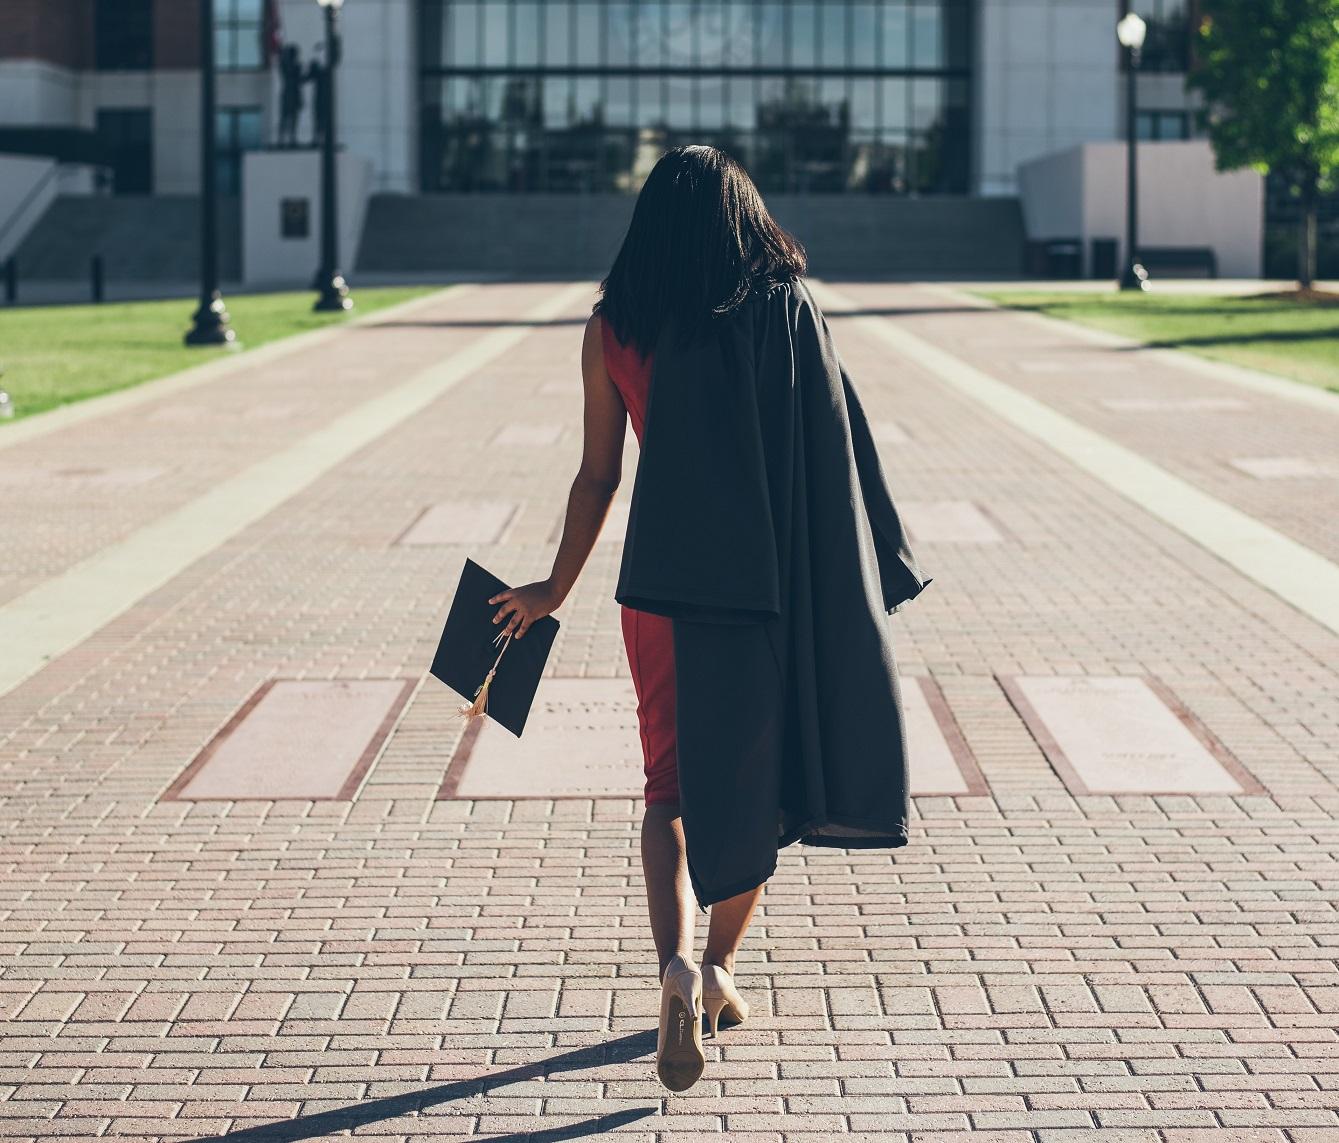 girl in graduation attire walking towards school